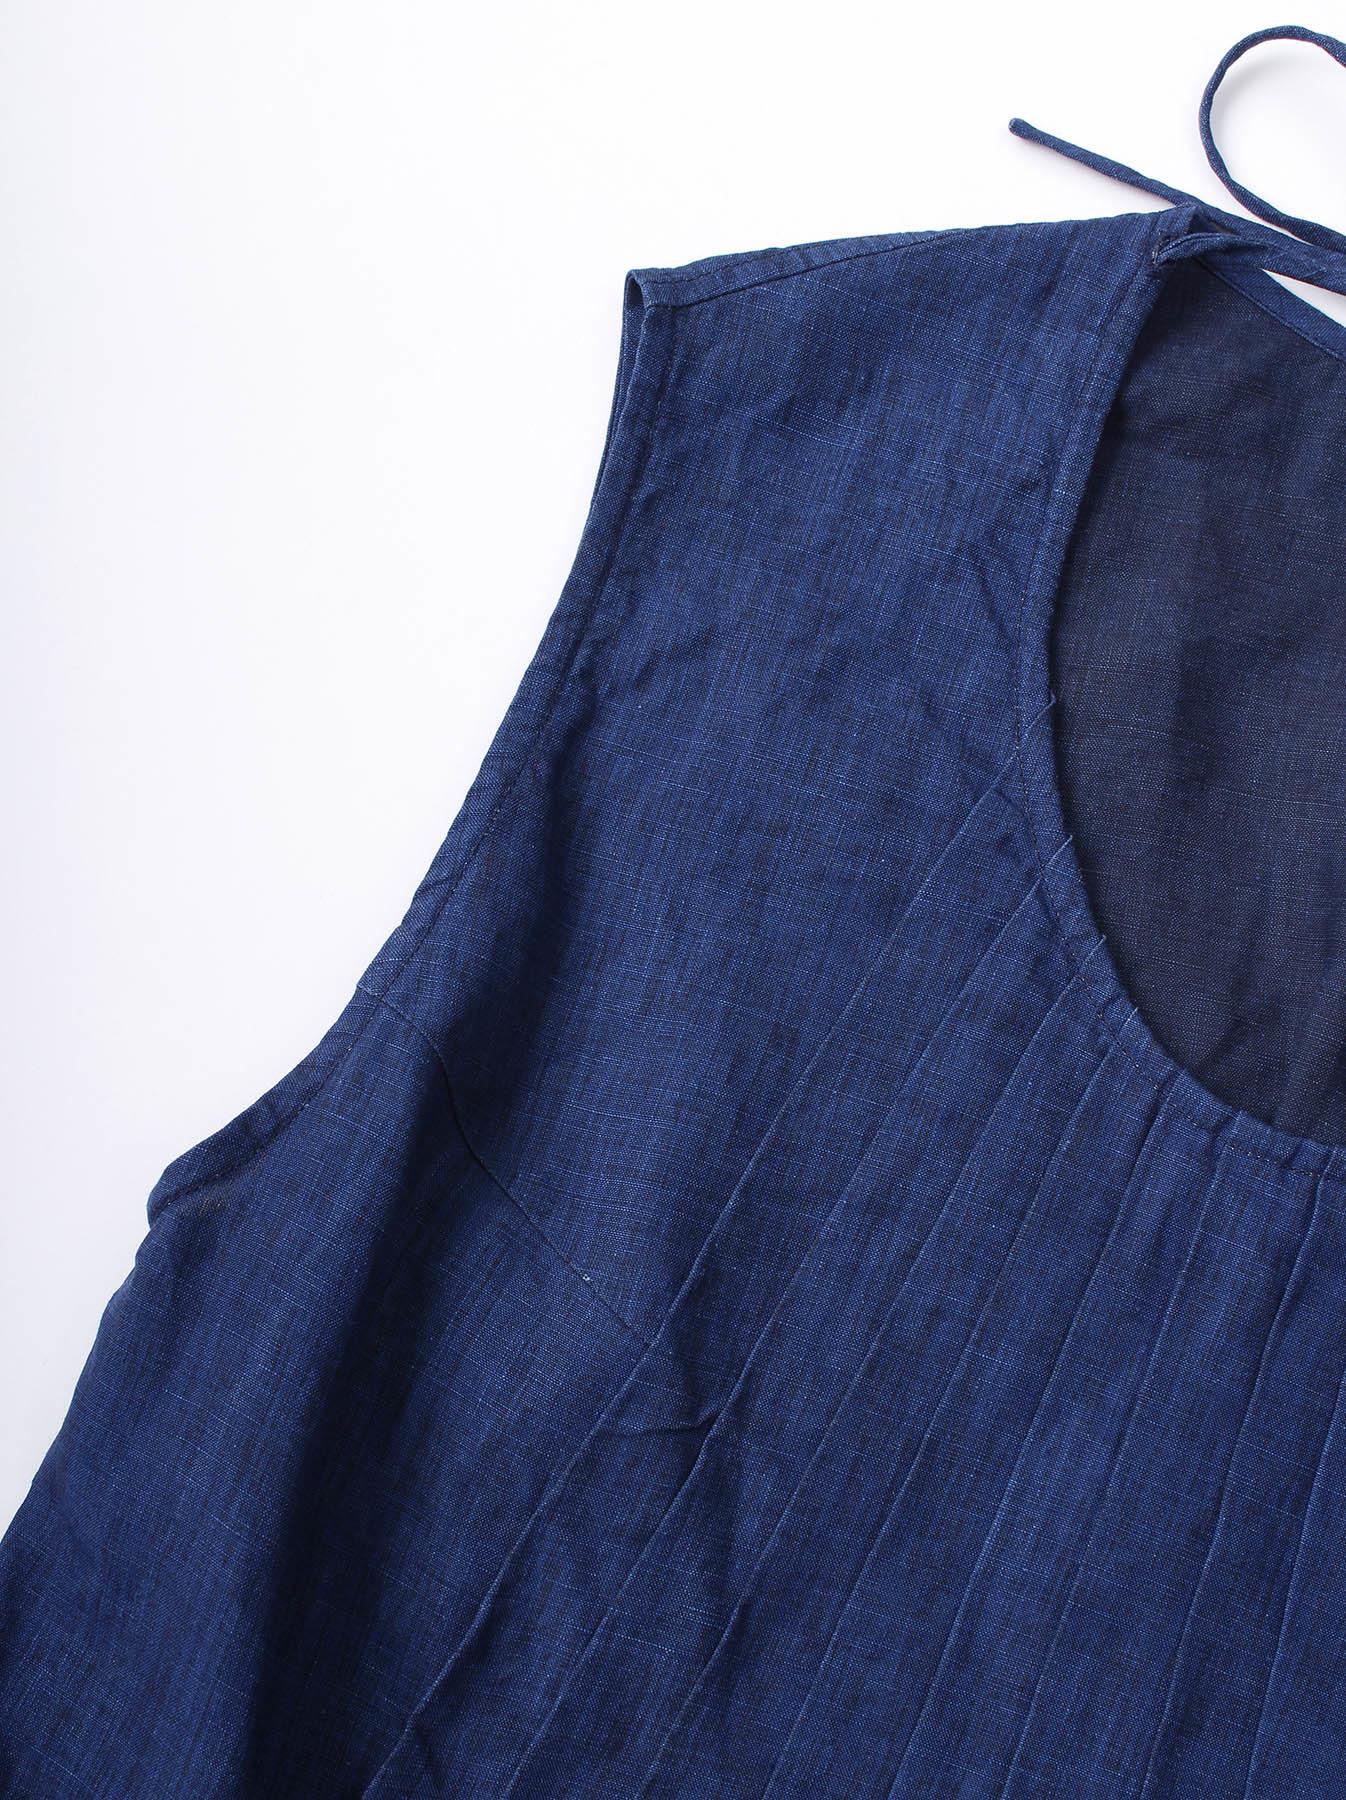 WH Indigo Linen Sleeveless Tuck Blouse-10